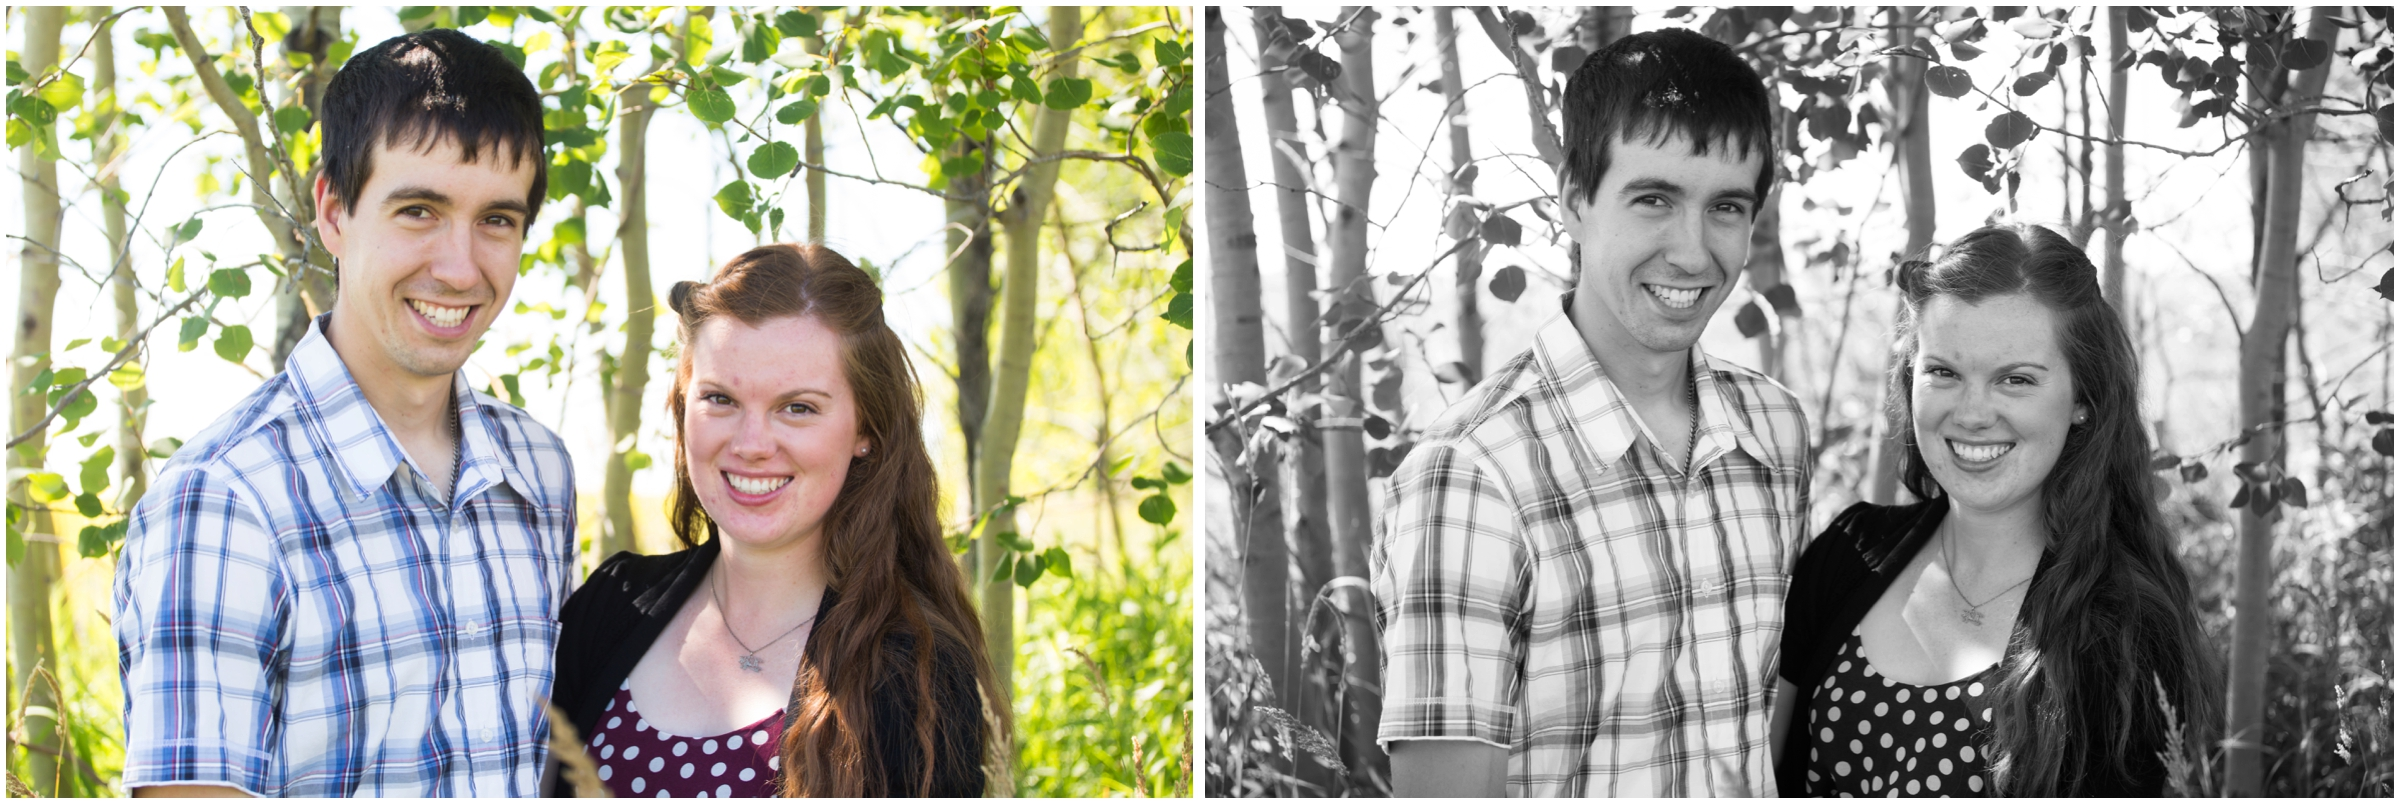 Hannah and Jarrett Selena Phillips-Boyle_0013.jpg